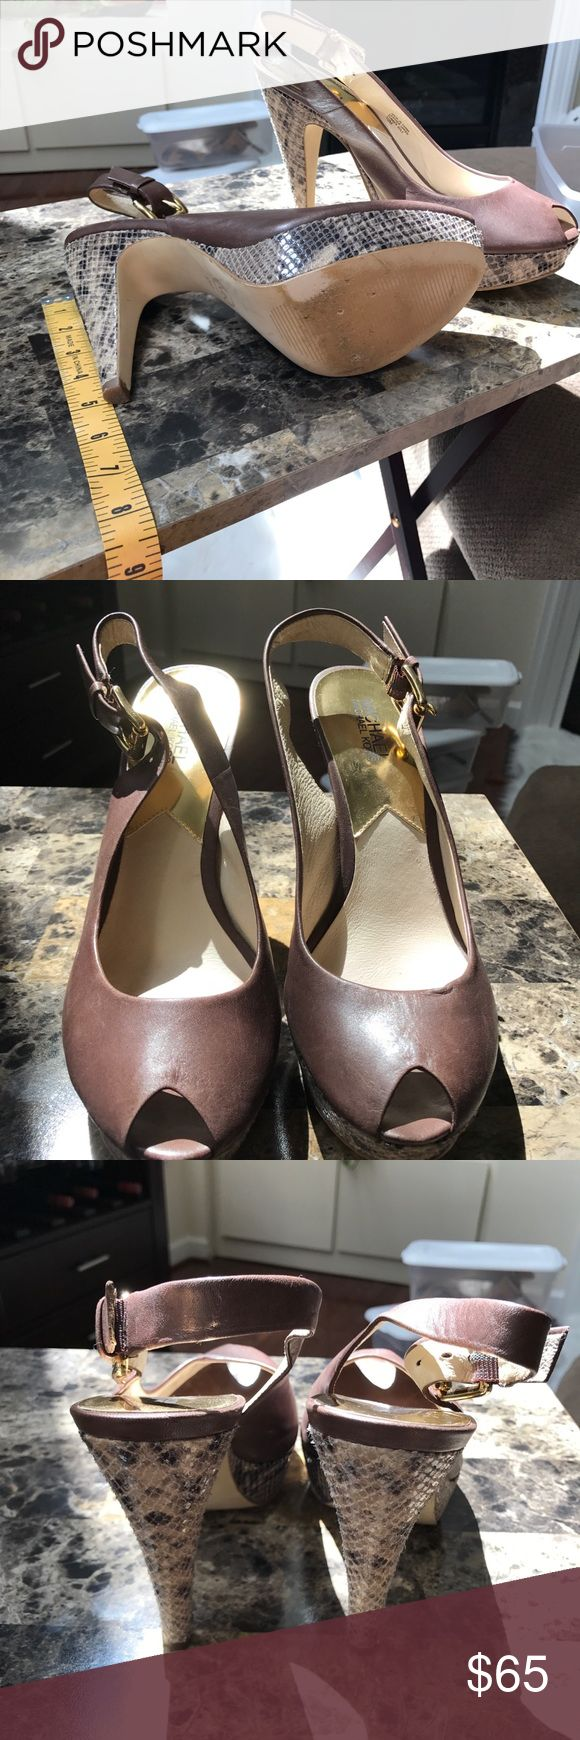 "Michael Kors peeptoe platform brown snakeskin heel 5"" heels brown leather peep toe with back ankle strap with gold colored buckle. Heel and platform is snakeskin. Shoe is used but in good condition. KORS Michael Kors Shoes Heels"